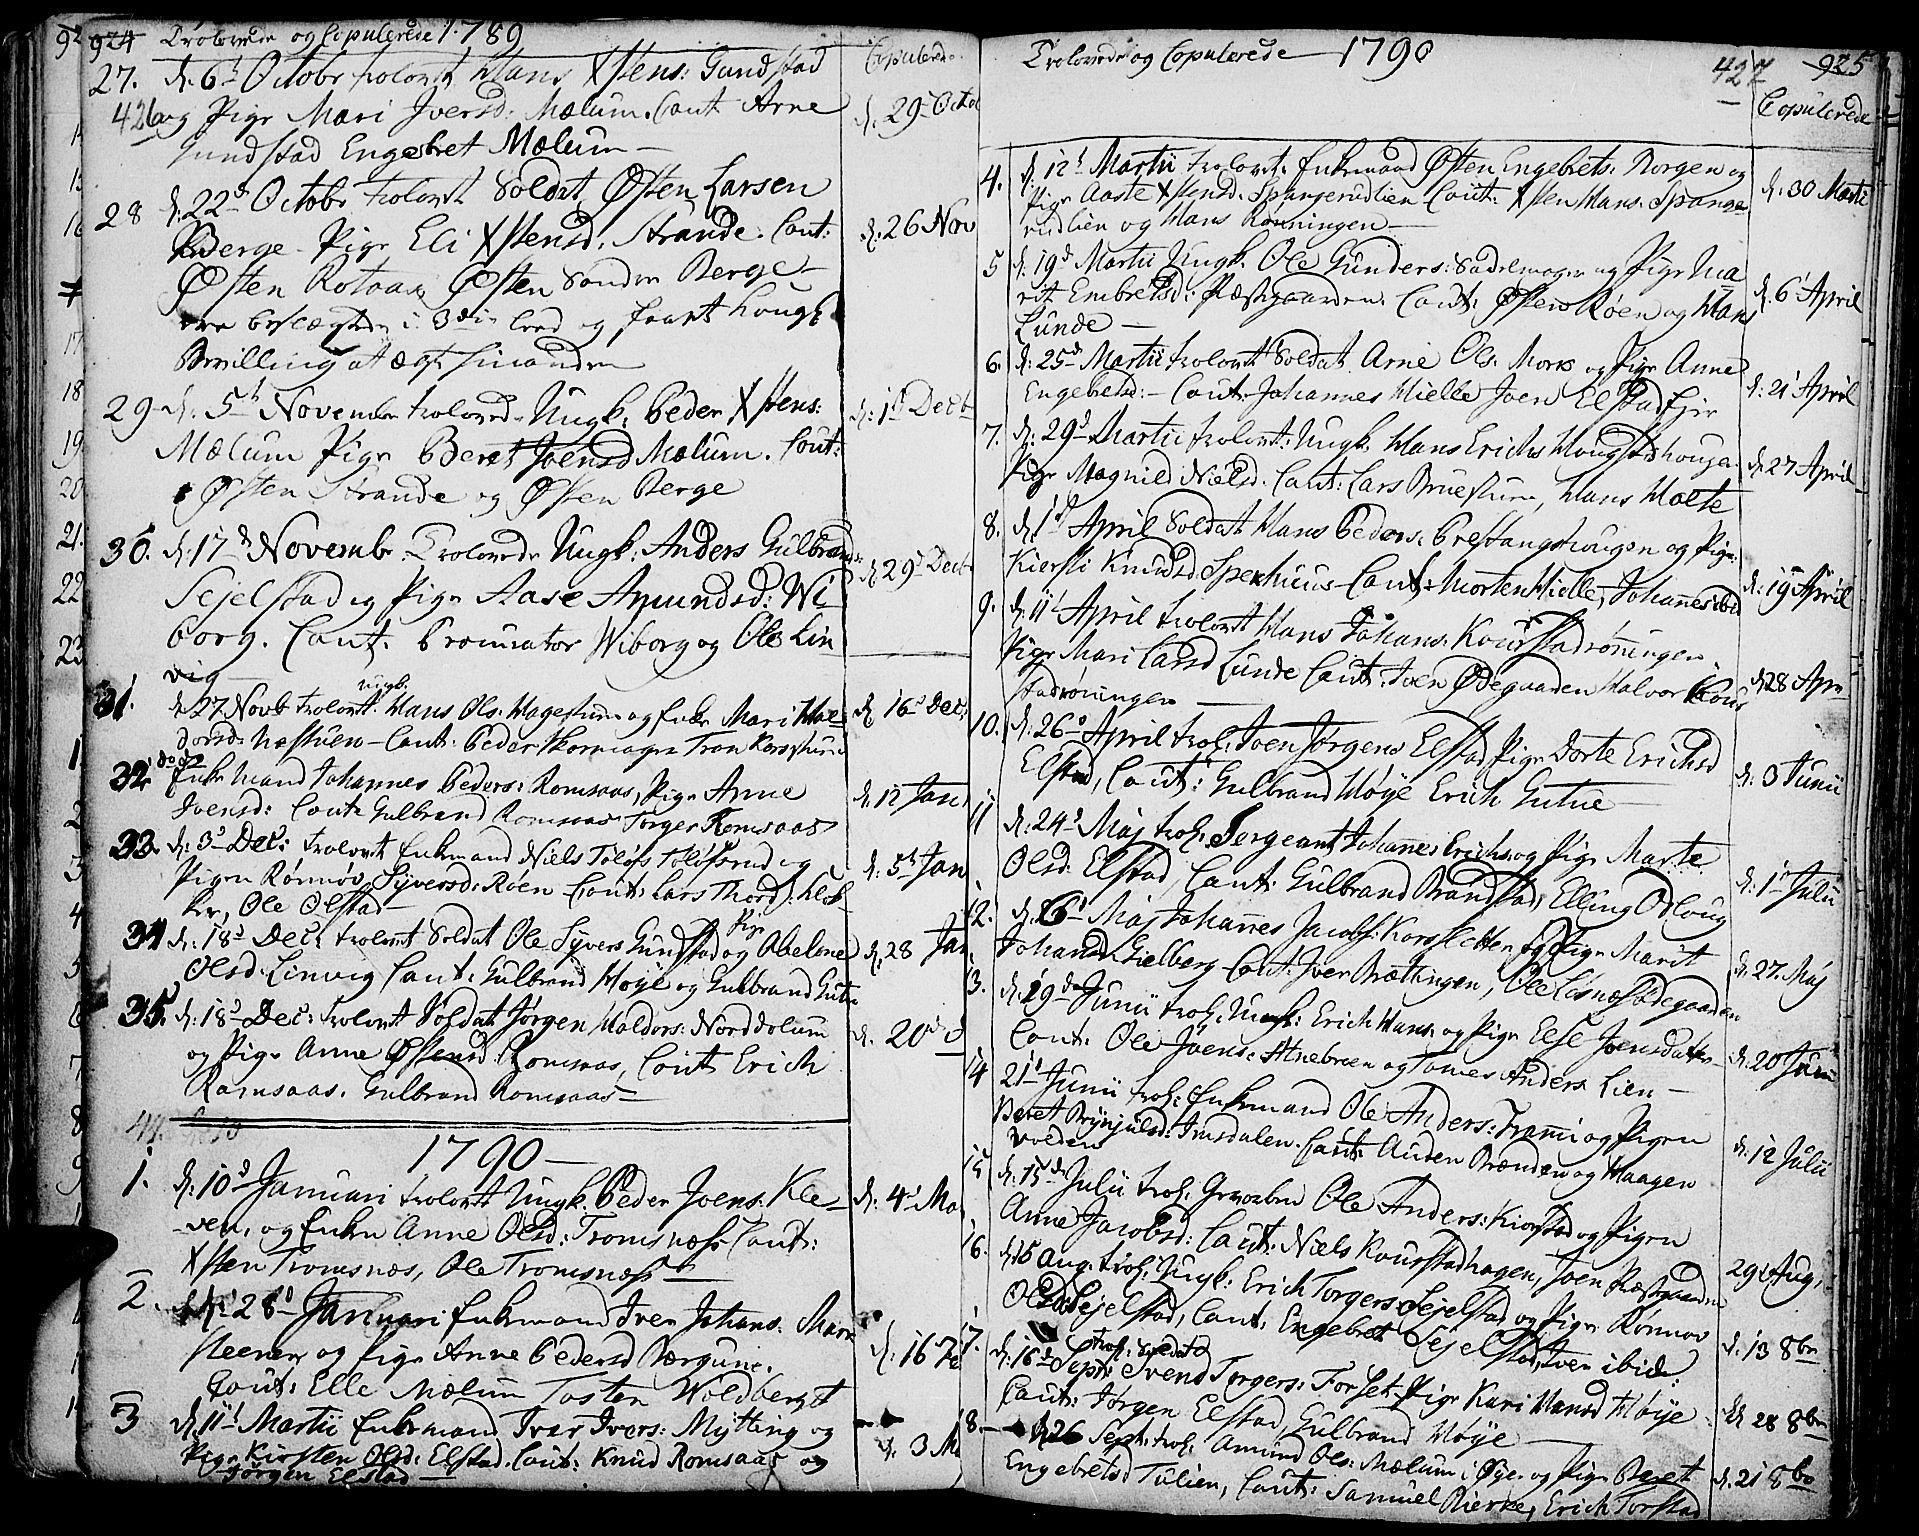 SAH, Ringebu prestekontor, Ministerialbok nr. 3, 1781-1820, s. 426-427